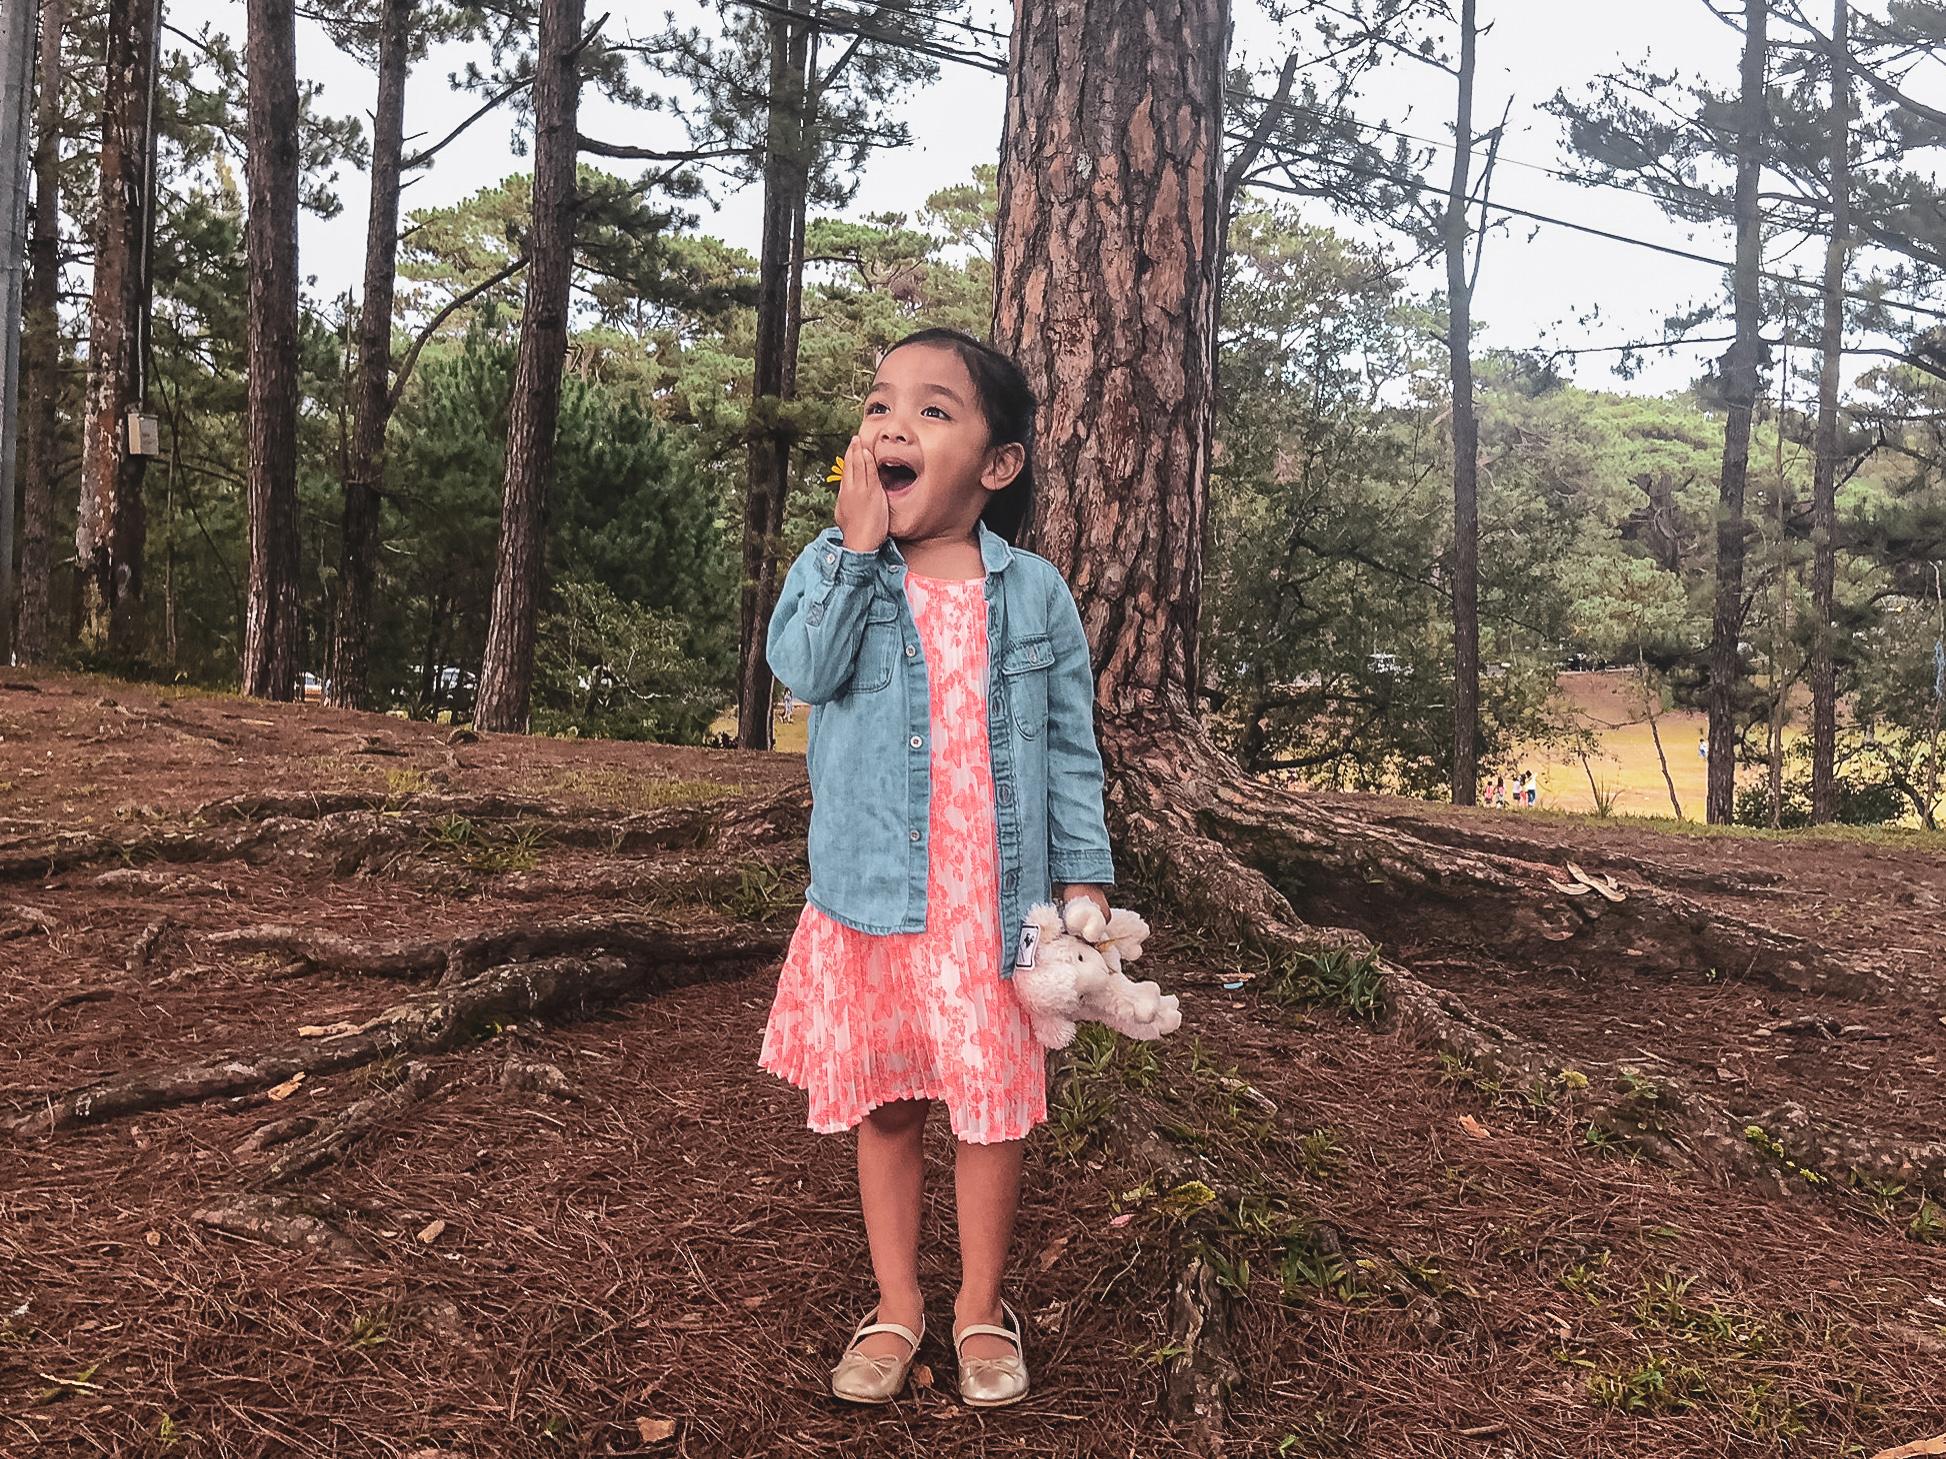 Kerrigan in the pine trees